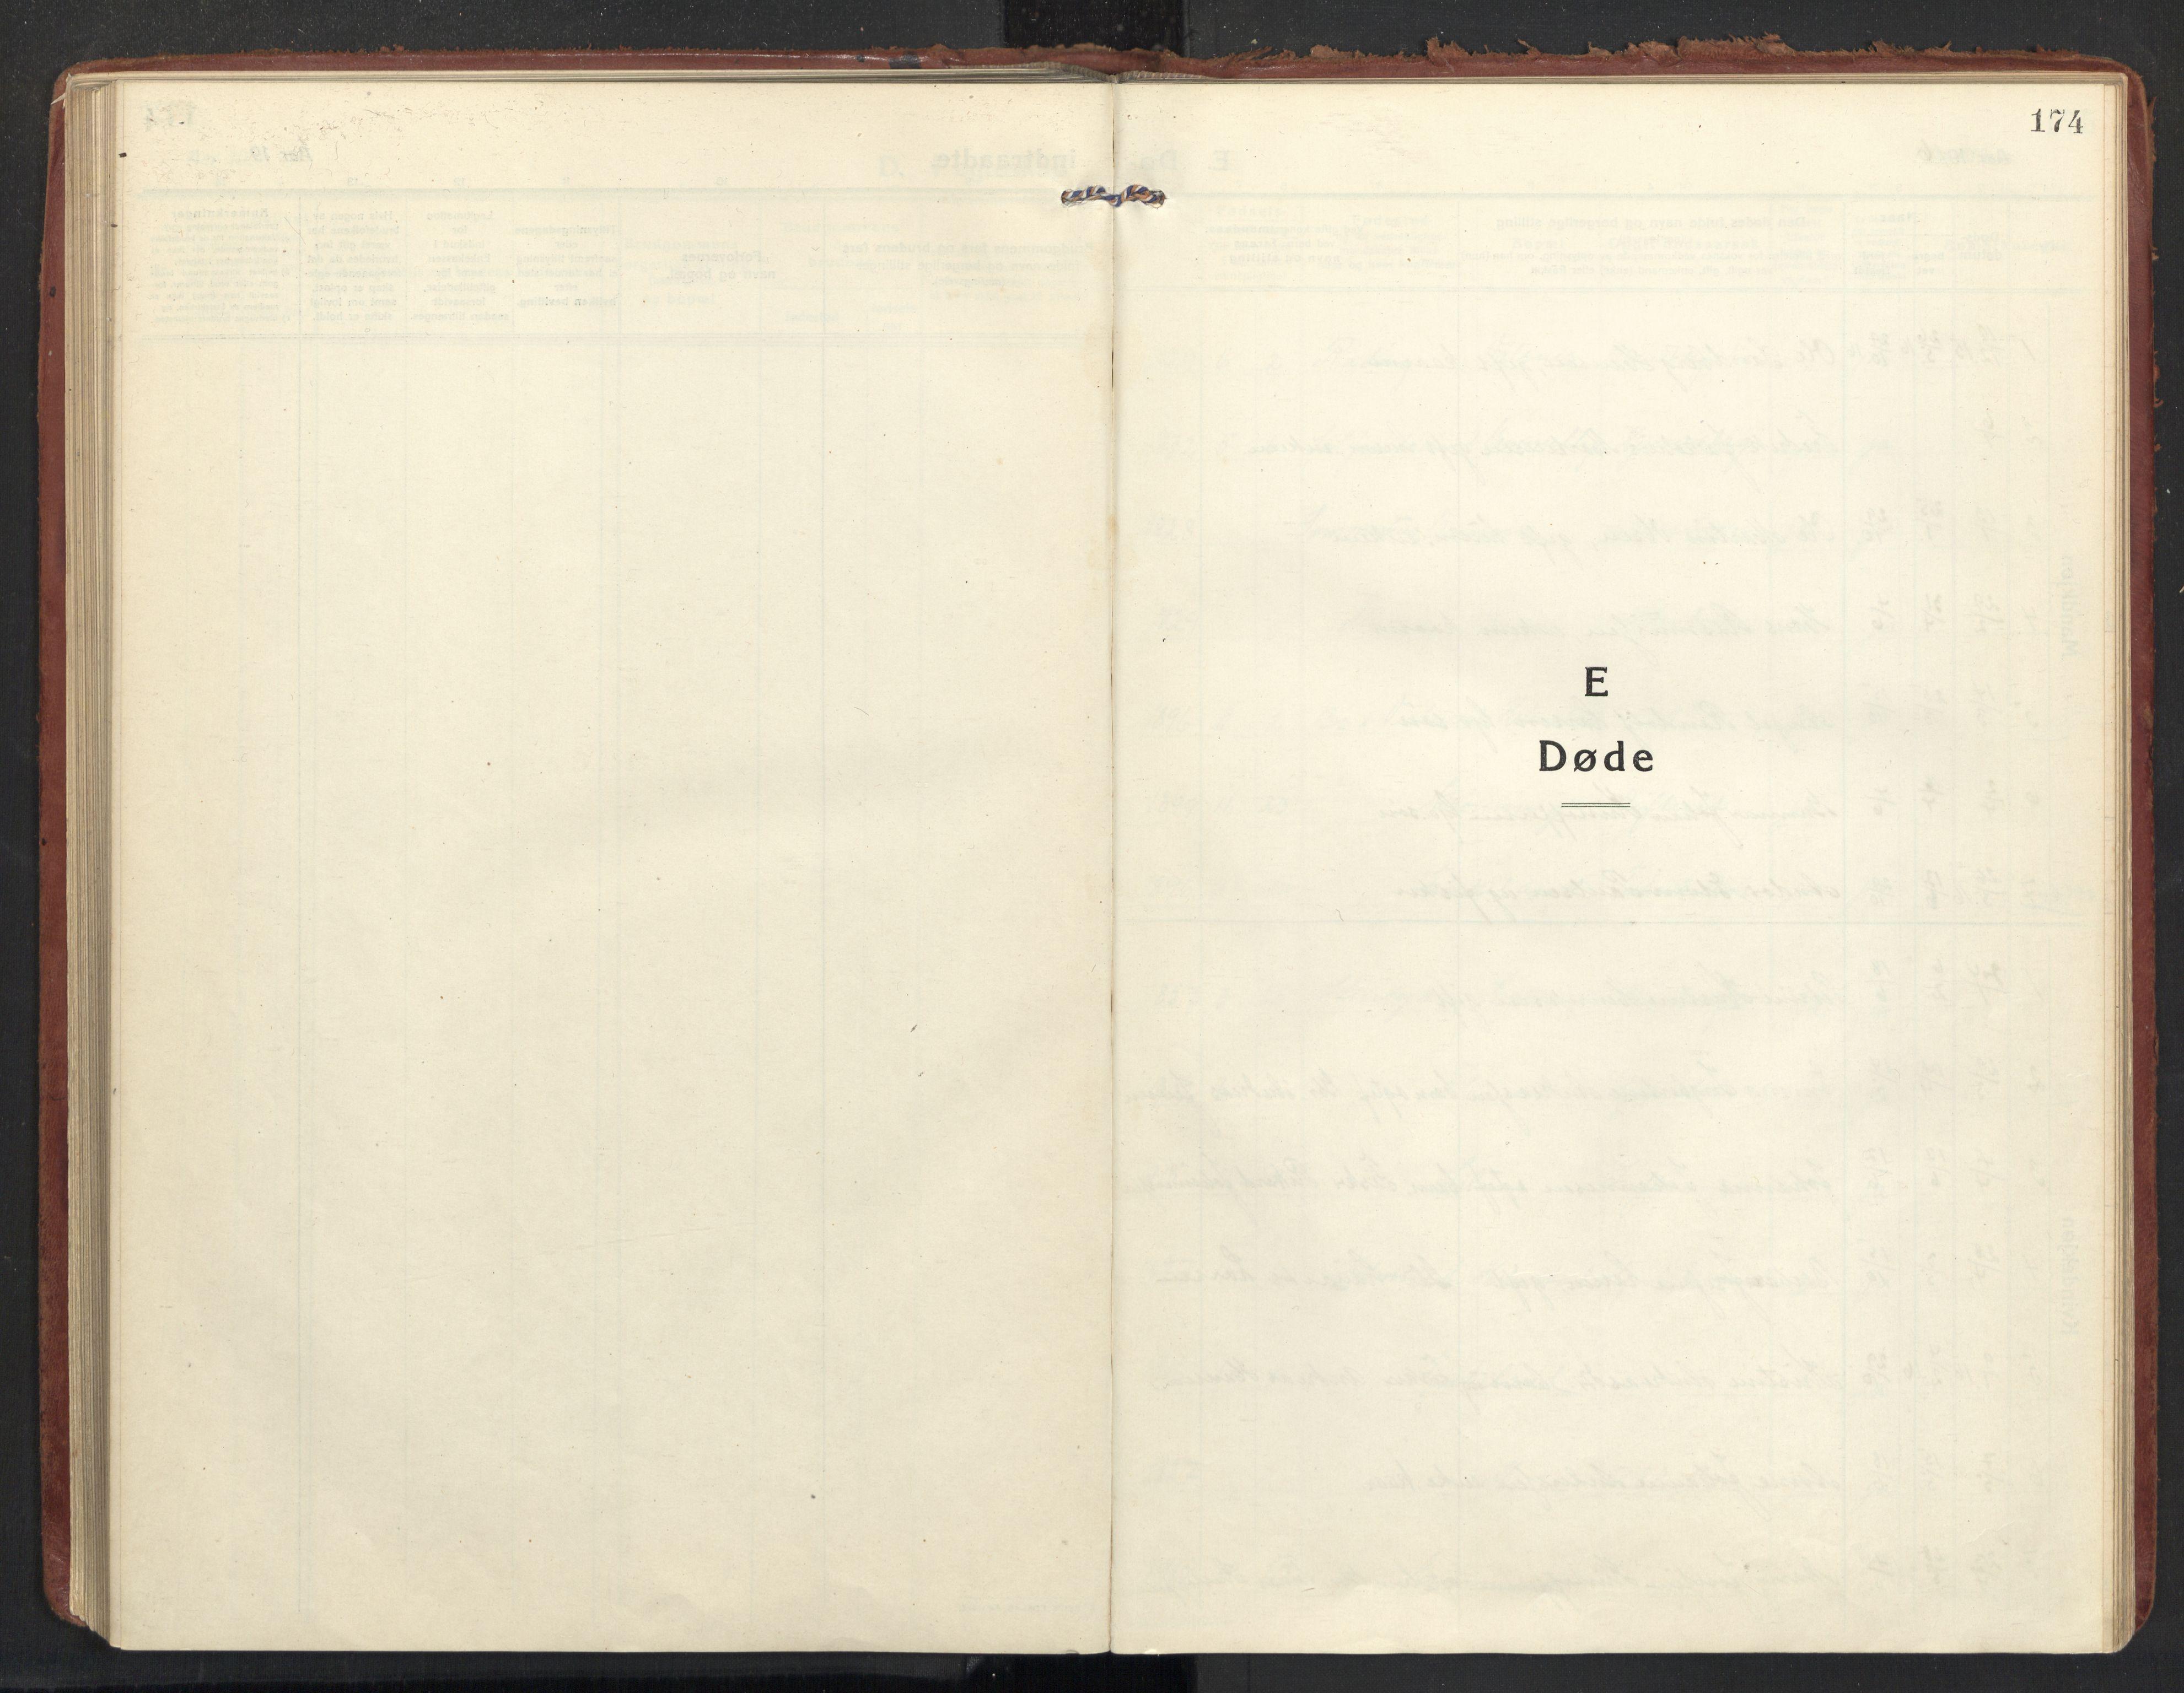 SAT, Ministerialprotokoller, klokkerbøker og fødselsregistre - Nordland, 890/L1288: Ministerialbok nr. 890A03, 1915-1925, s. 174